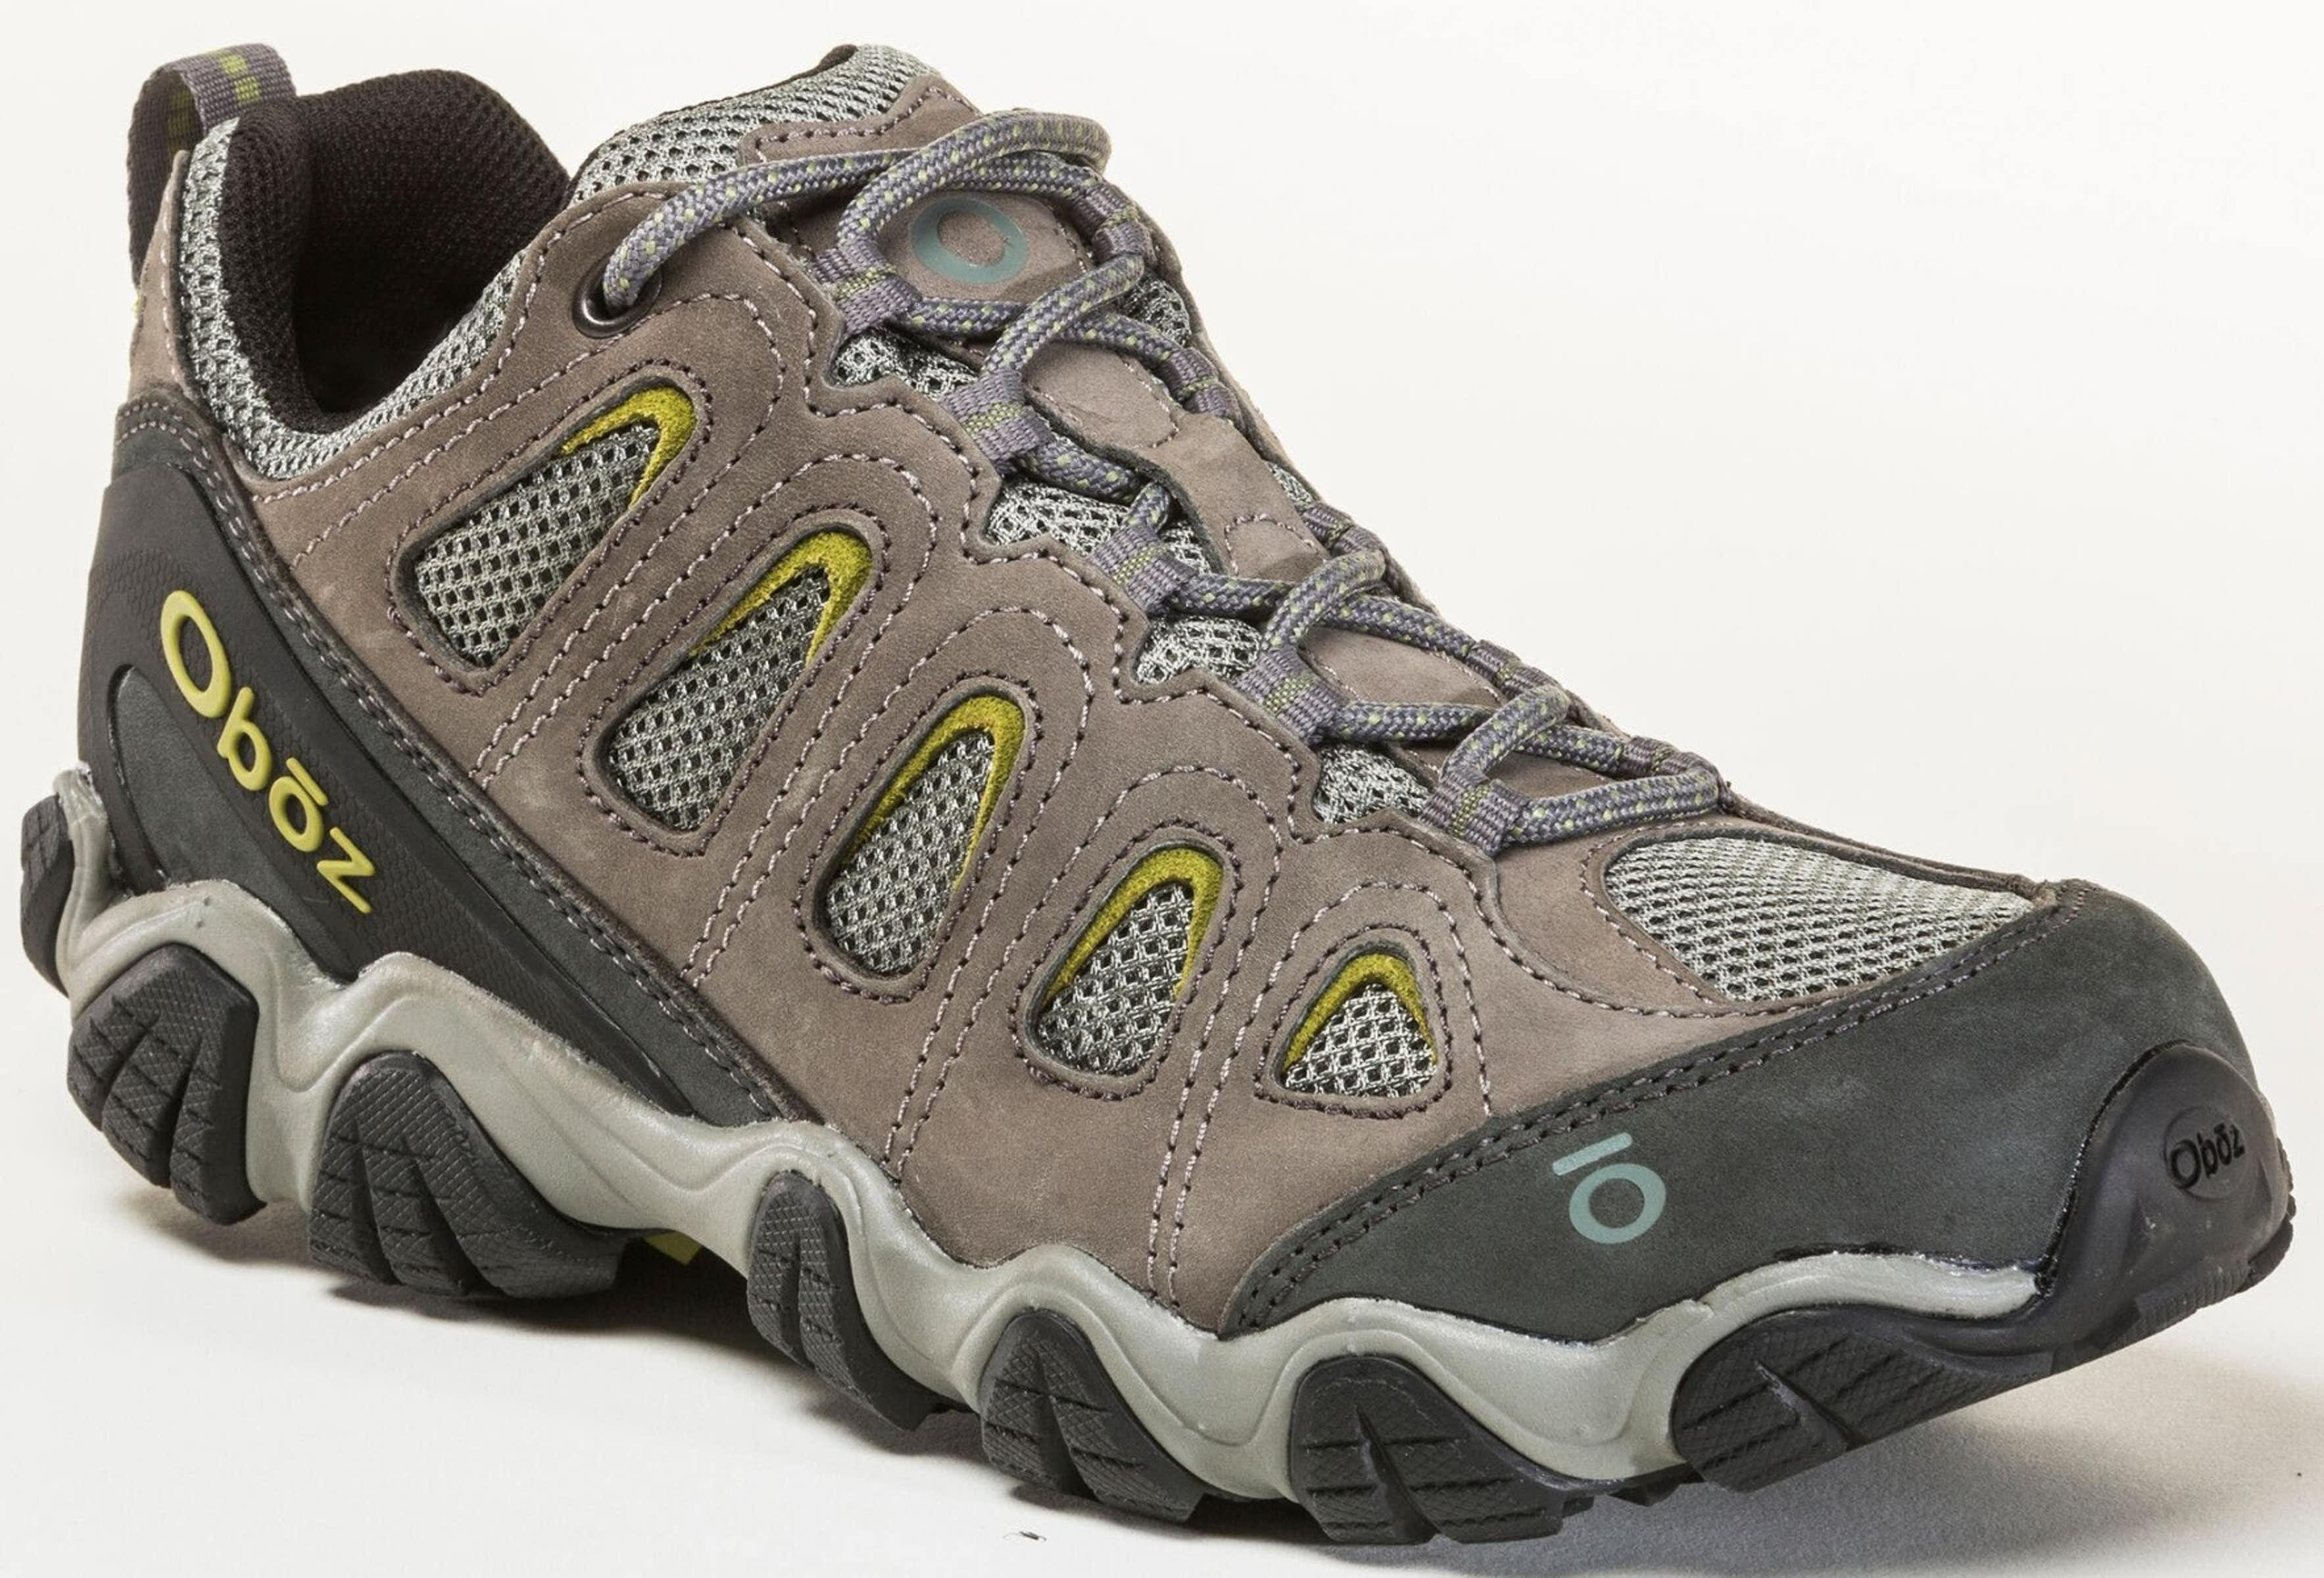 880548da4c3 Oboz Shoes, Sandals, Boots for women & men | Kathmandu AU